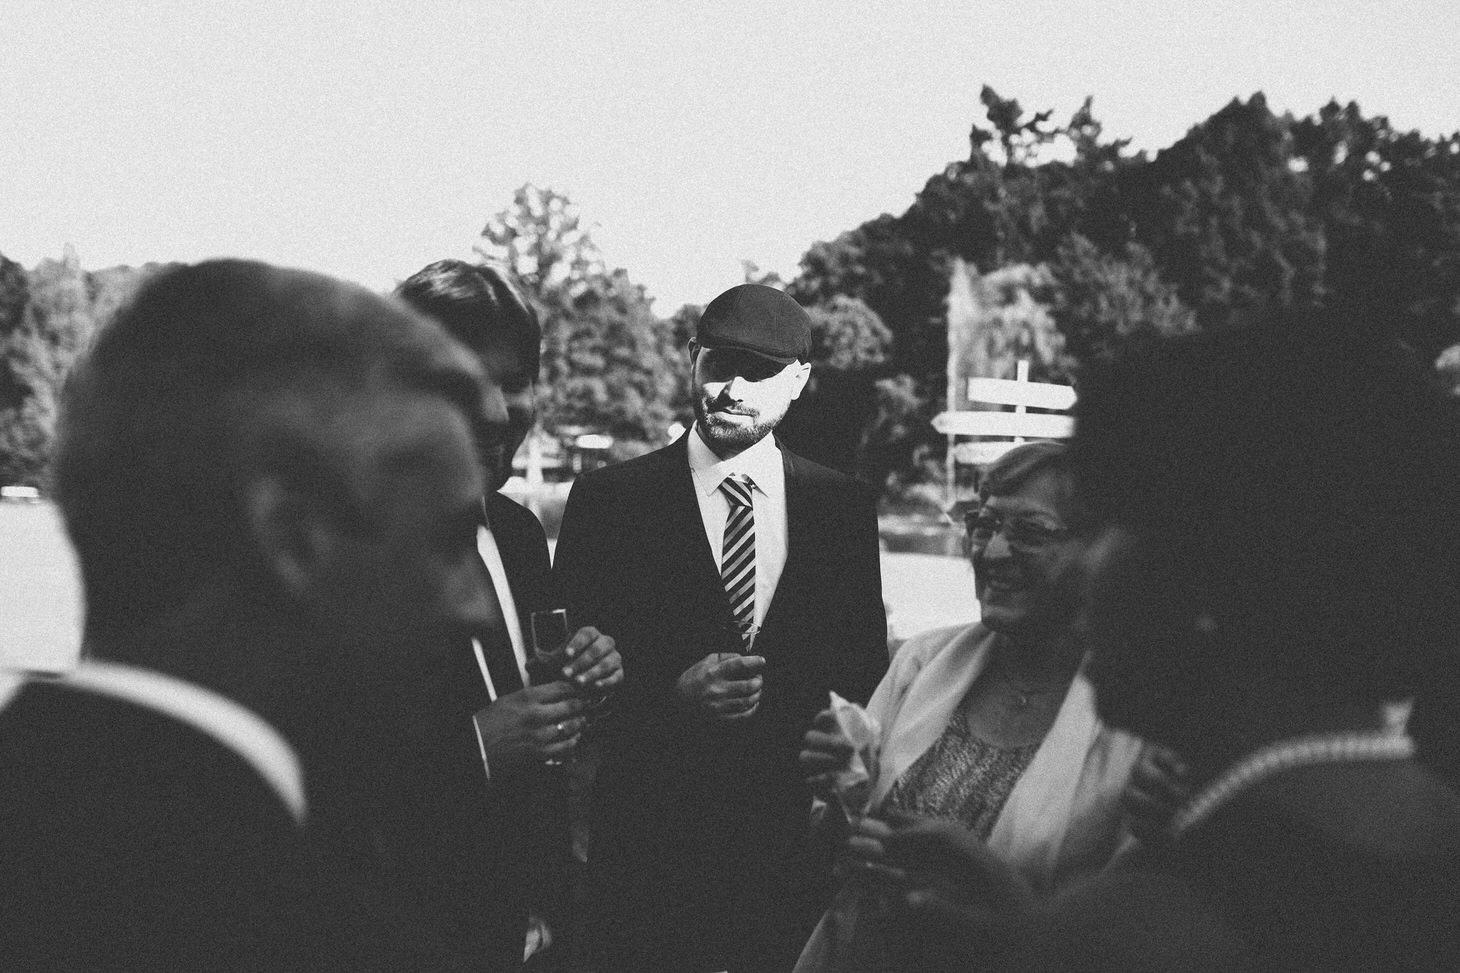 photographe-mariage-paris-montfort-l-amaury-071